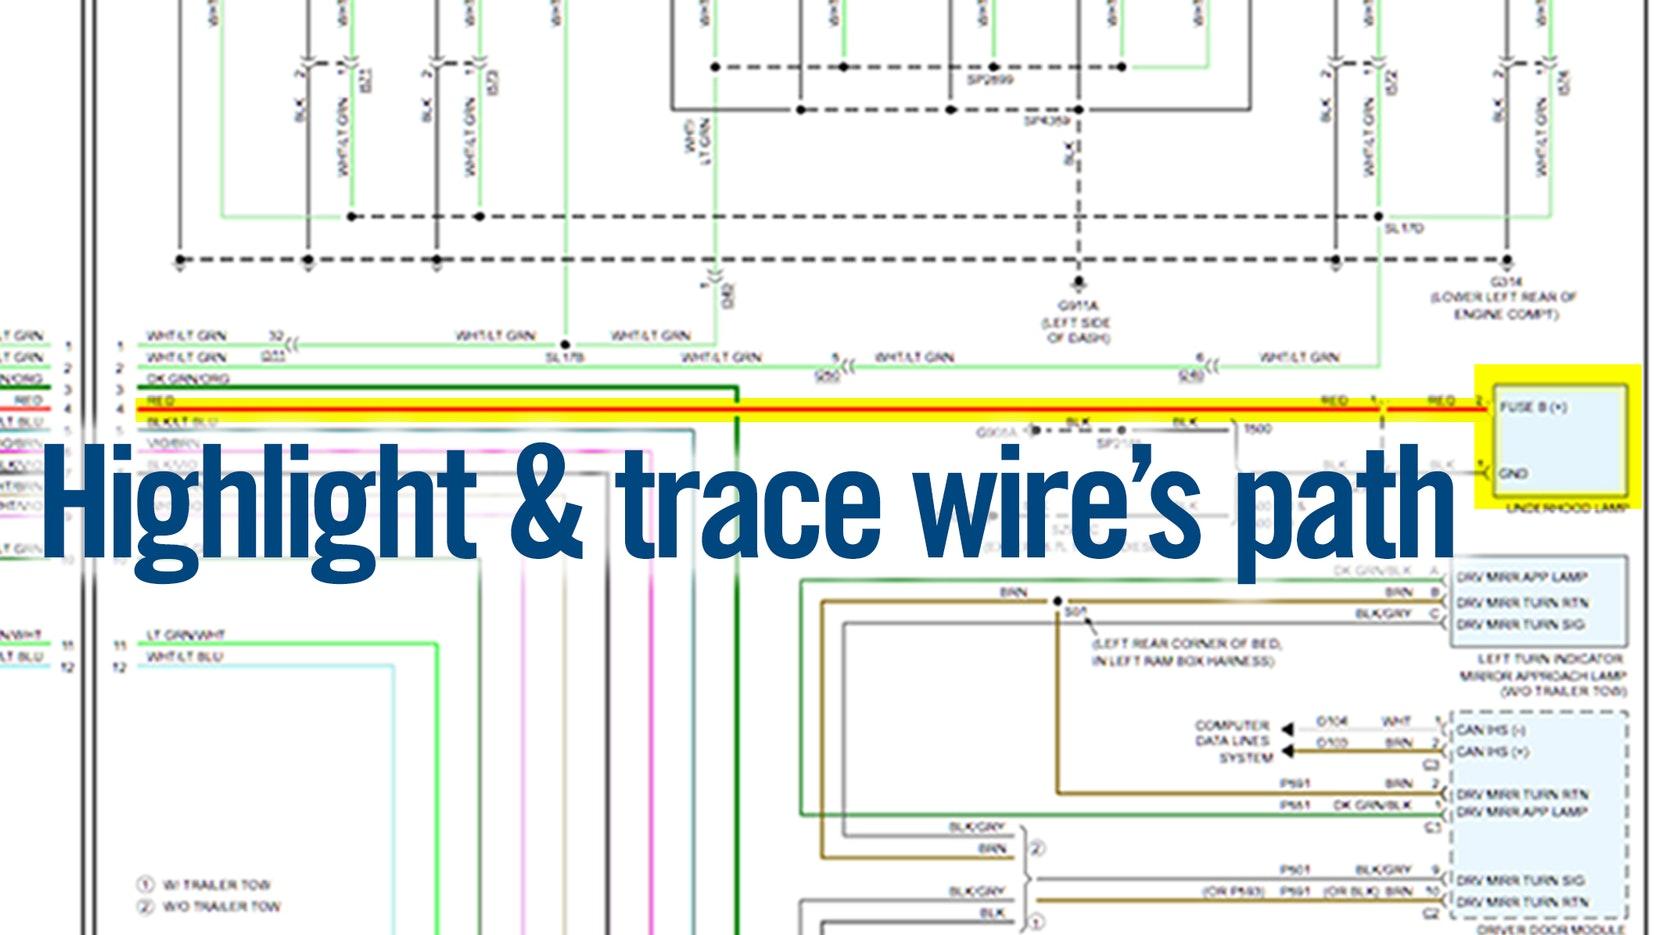 Alldata Updates Color Wiring Diagrams To Include Both Non